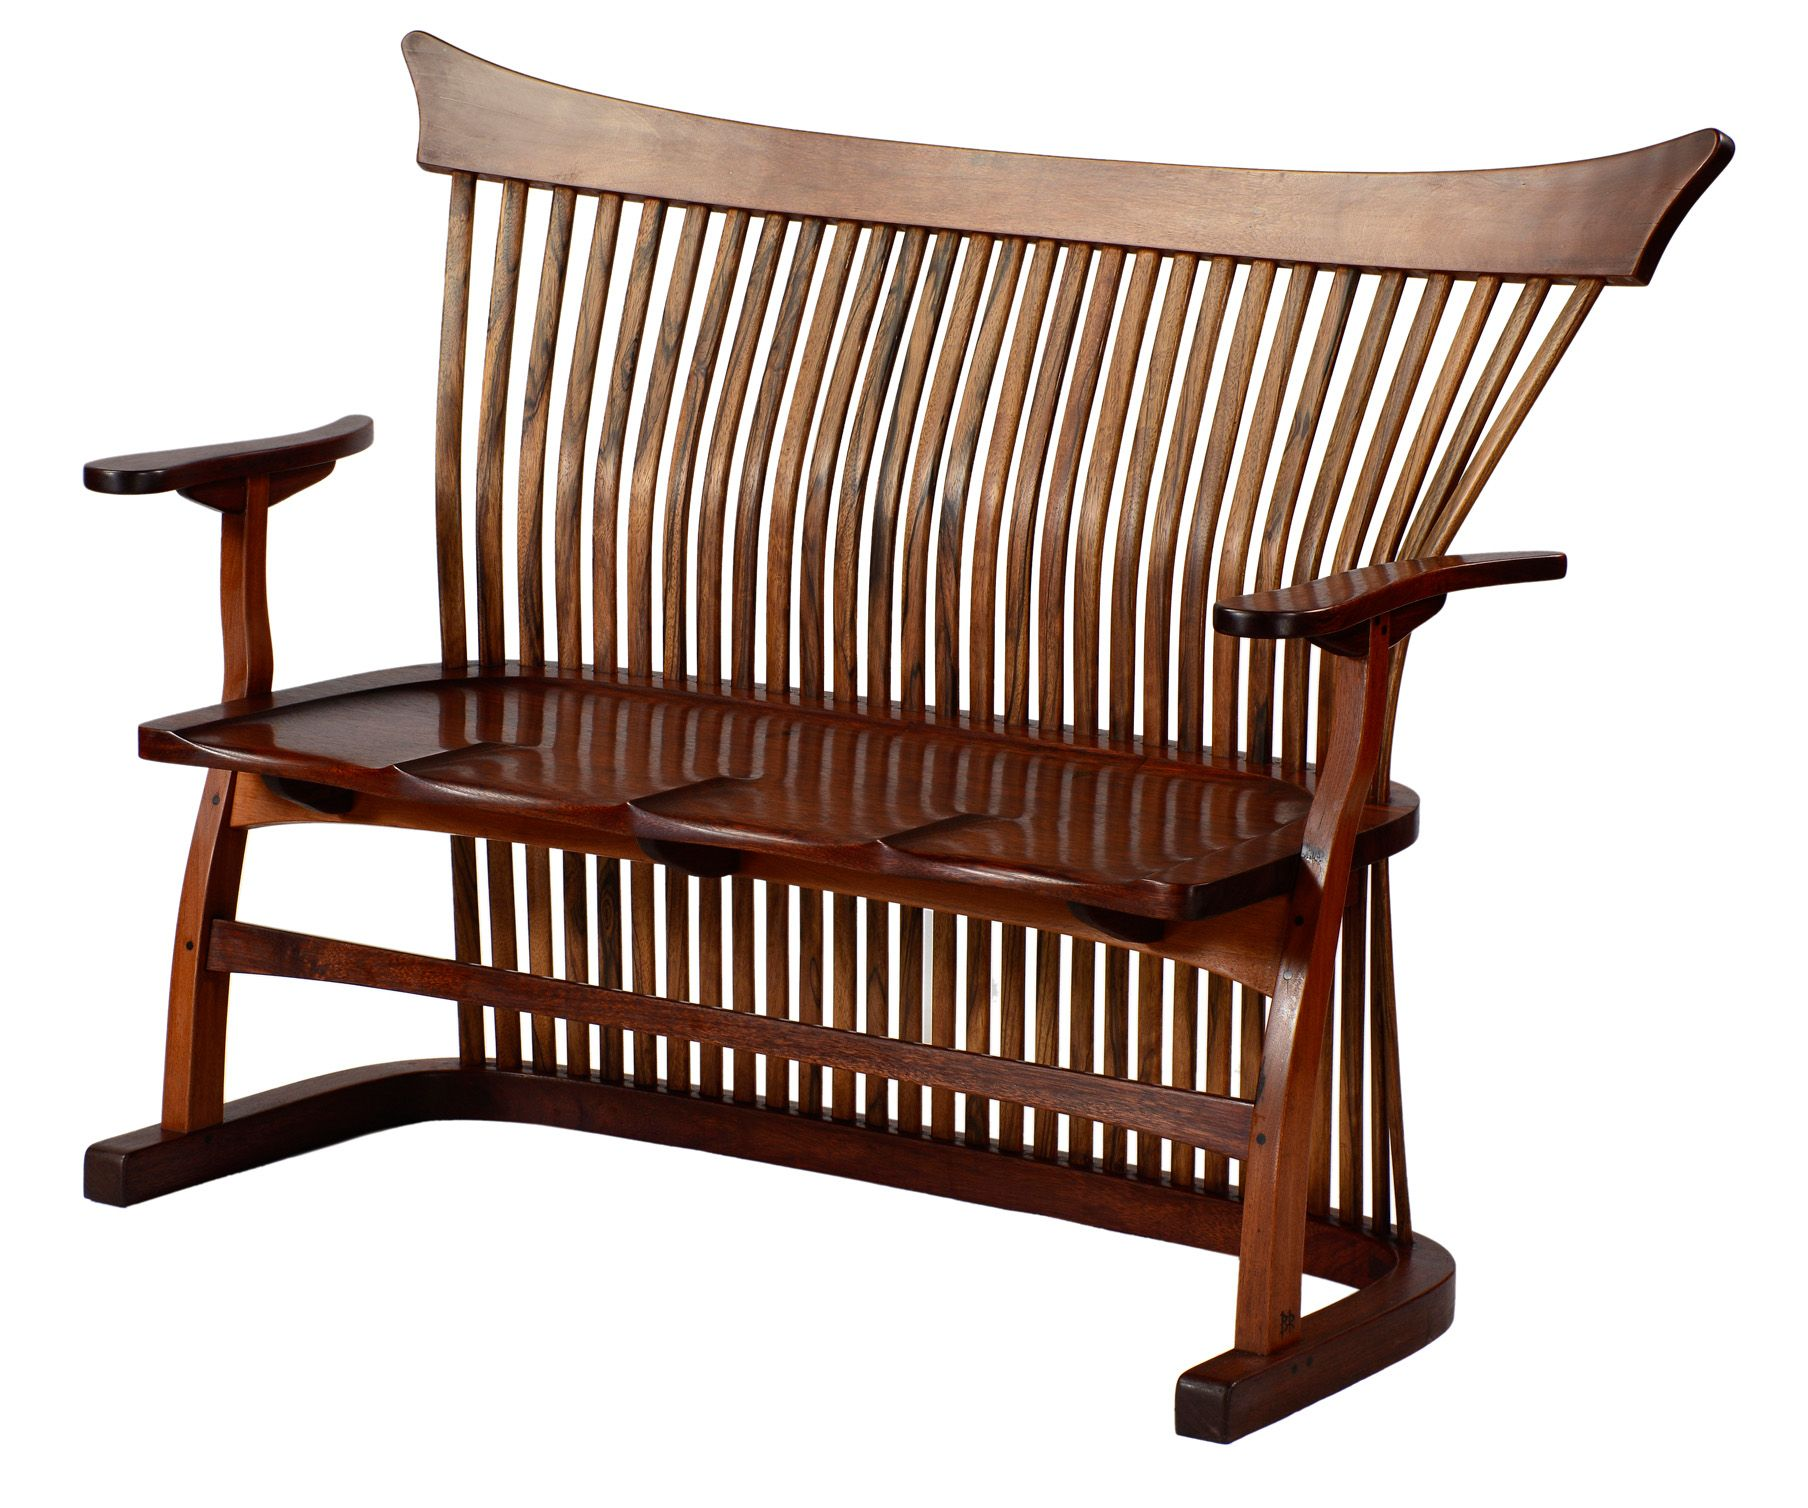 Wicker Sofa Set Philippines Brown Klippan Cover Lola Basyang Bench Benji Reyes Home Pinterest